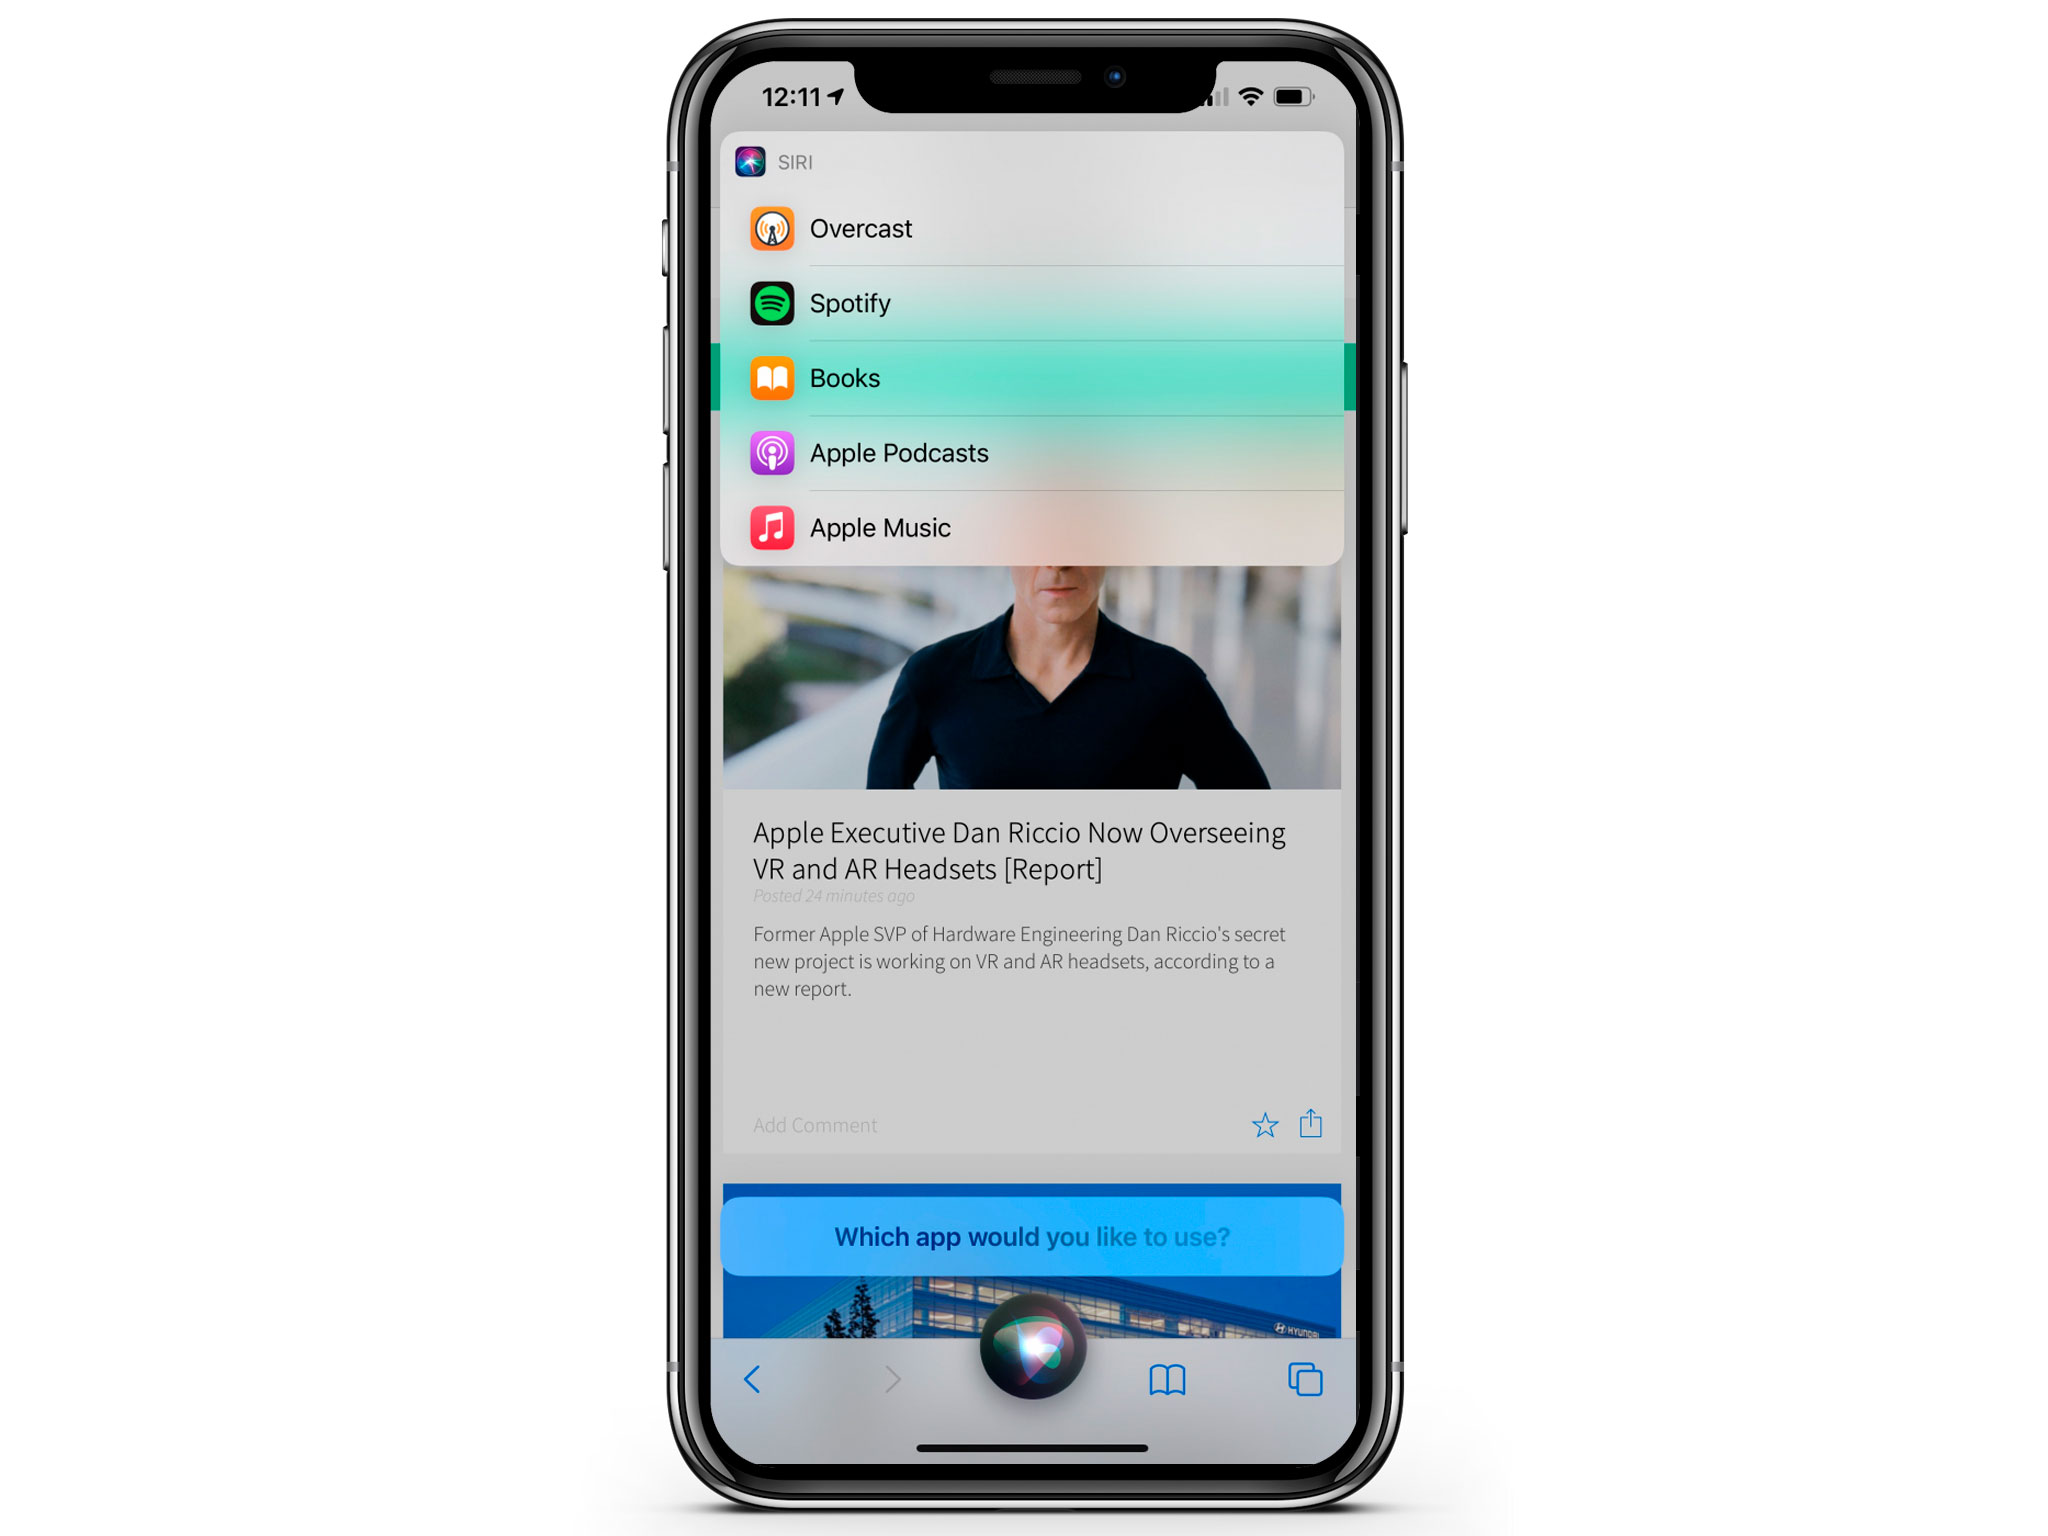 https://www.macfreak.nl/modules/news/images/zArt.iOS14.5SiriMusicPrompt.jpg